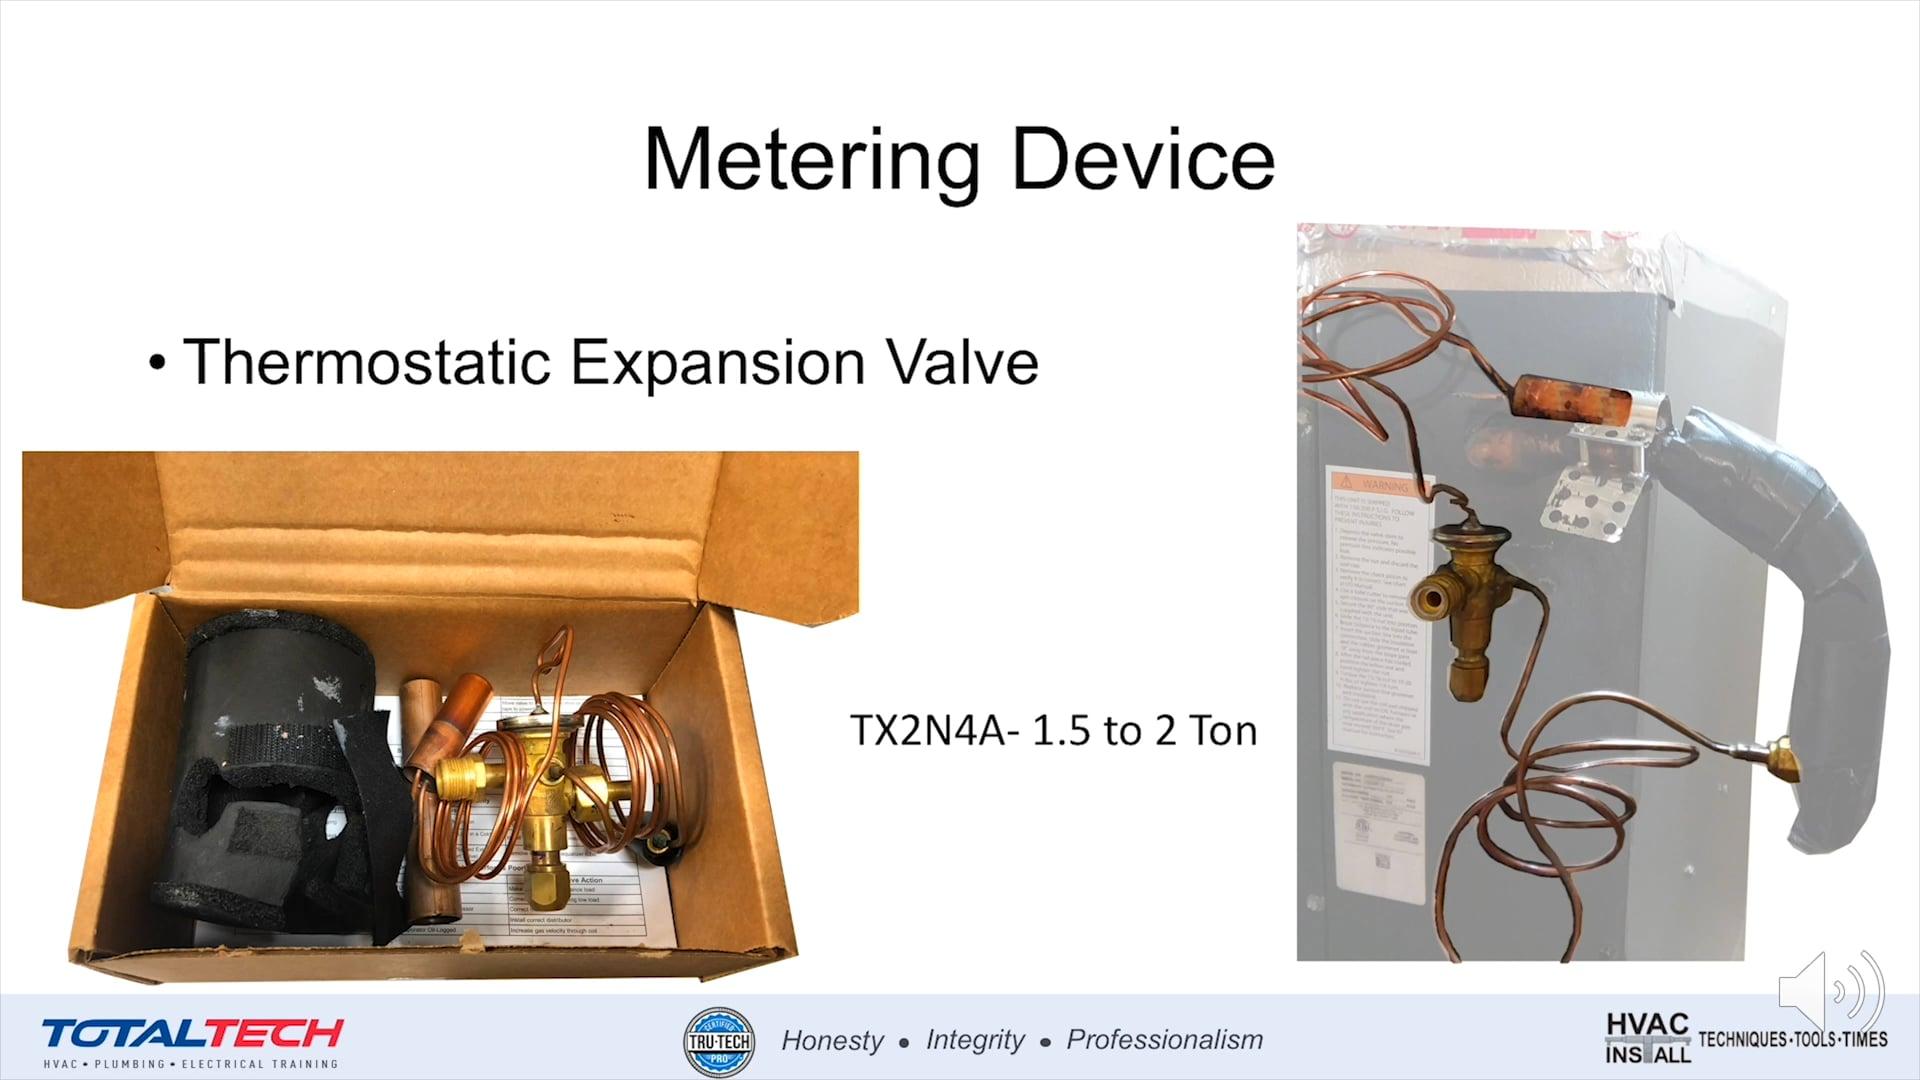 Installation-Thermostatic Expansion Valve Sizing